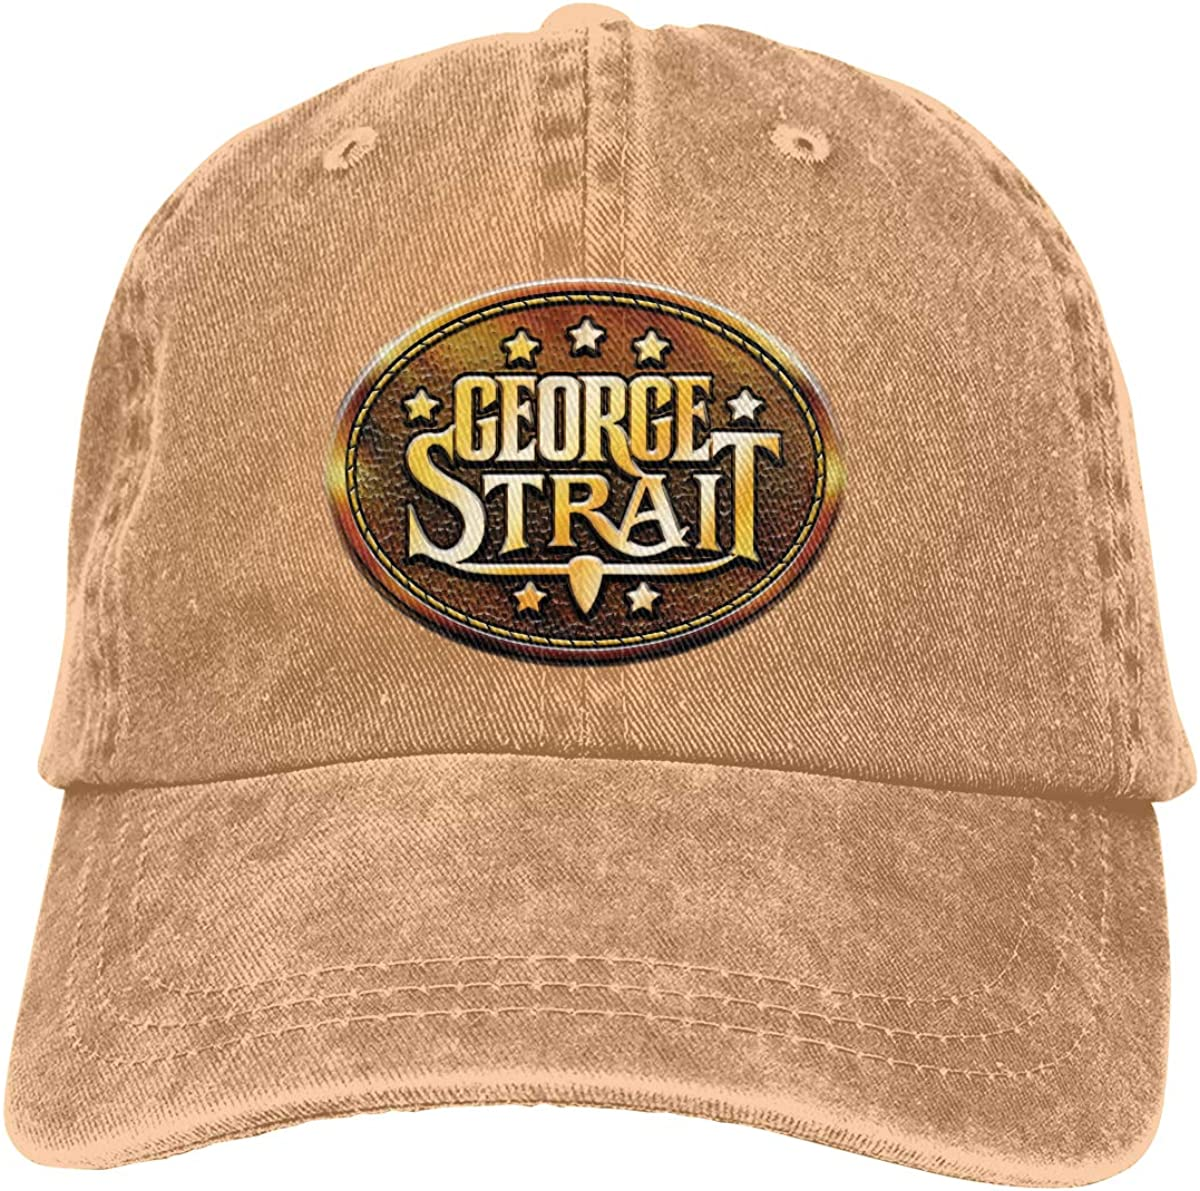 Robert S Villa George Strait Comfortable Plain Cotton Adjustable Washed Twill Low Profile Baseball-Cap Unisex Black